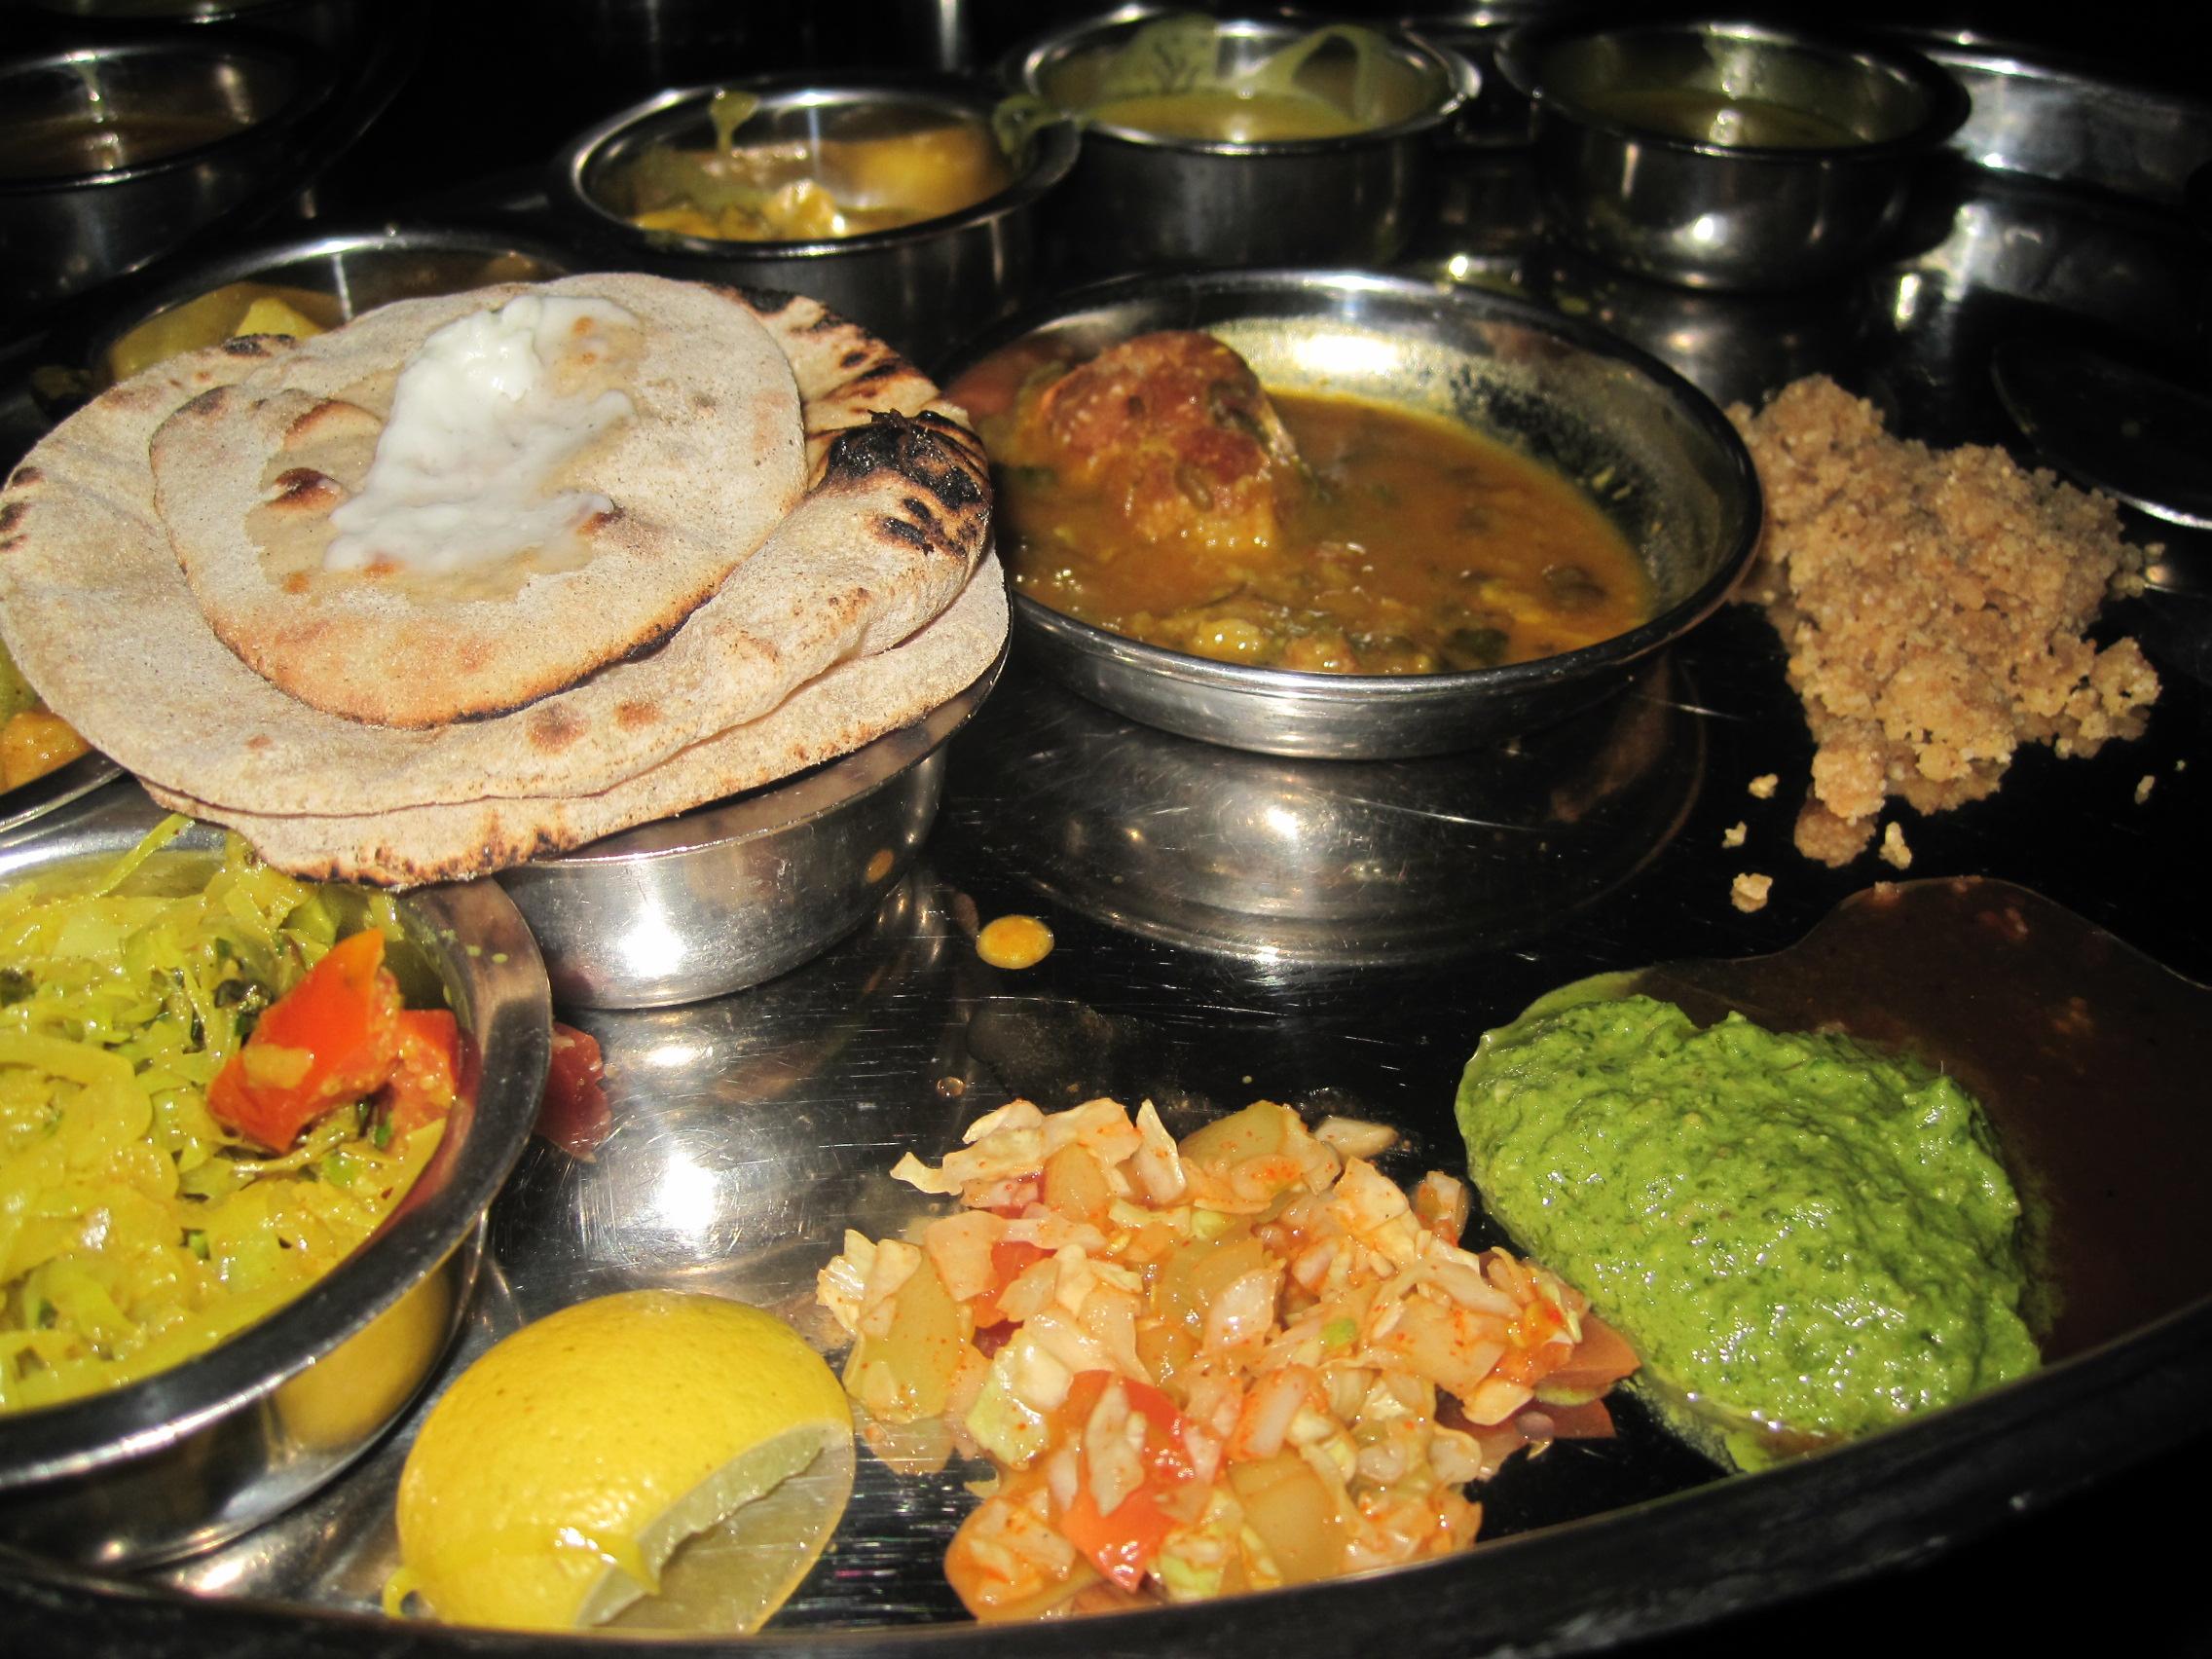 Rajasthani thali in Delhi, India